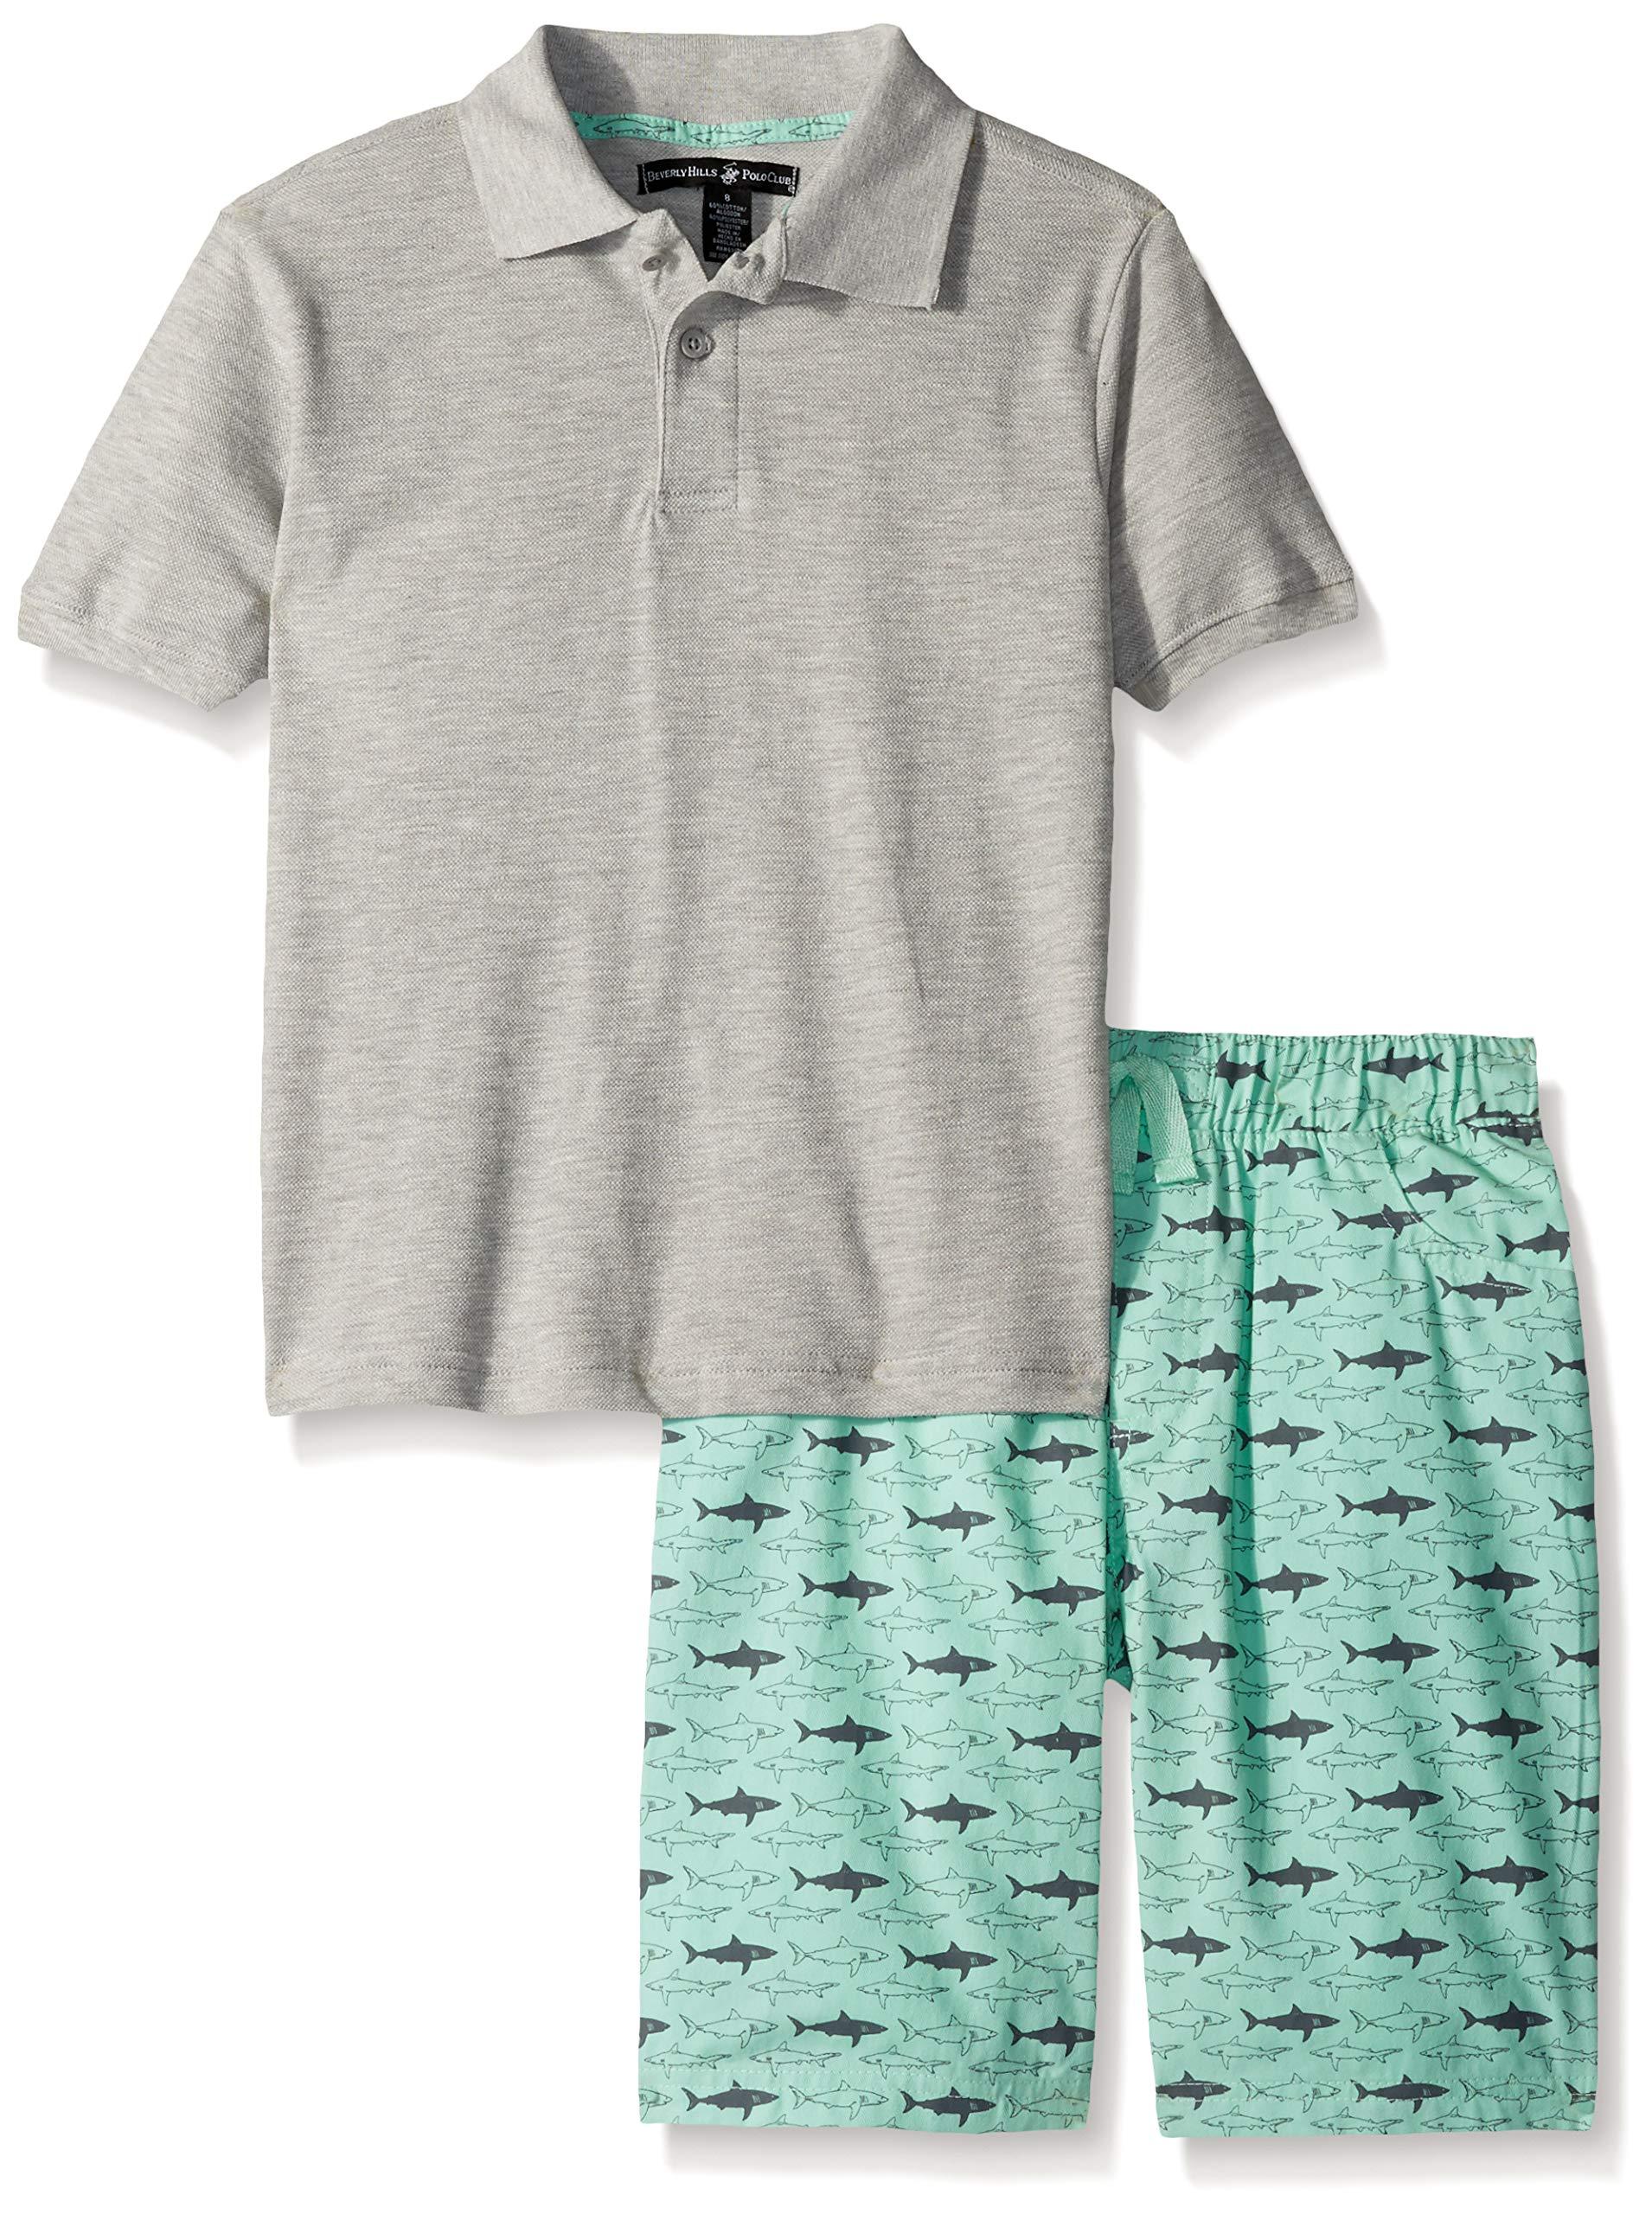 Beverly Hills Polo Club Boys' Little Sleeve top and Short Set, Grey Heather Shark 5/6